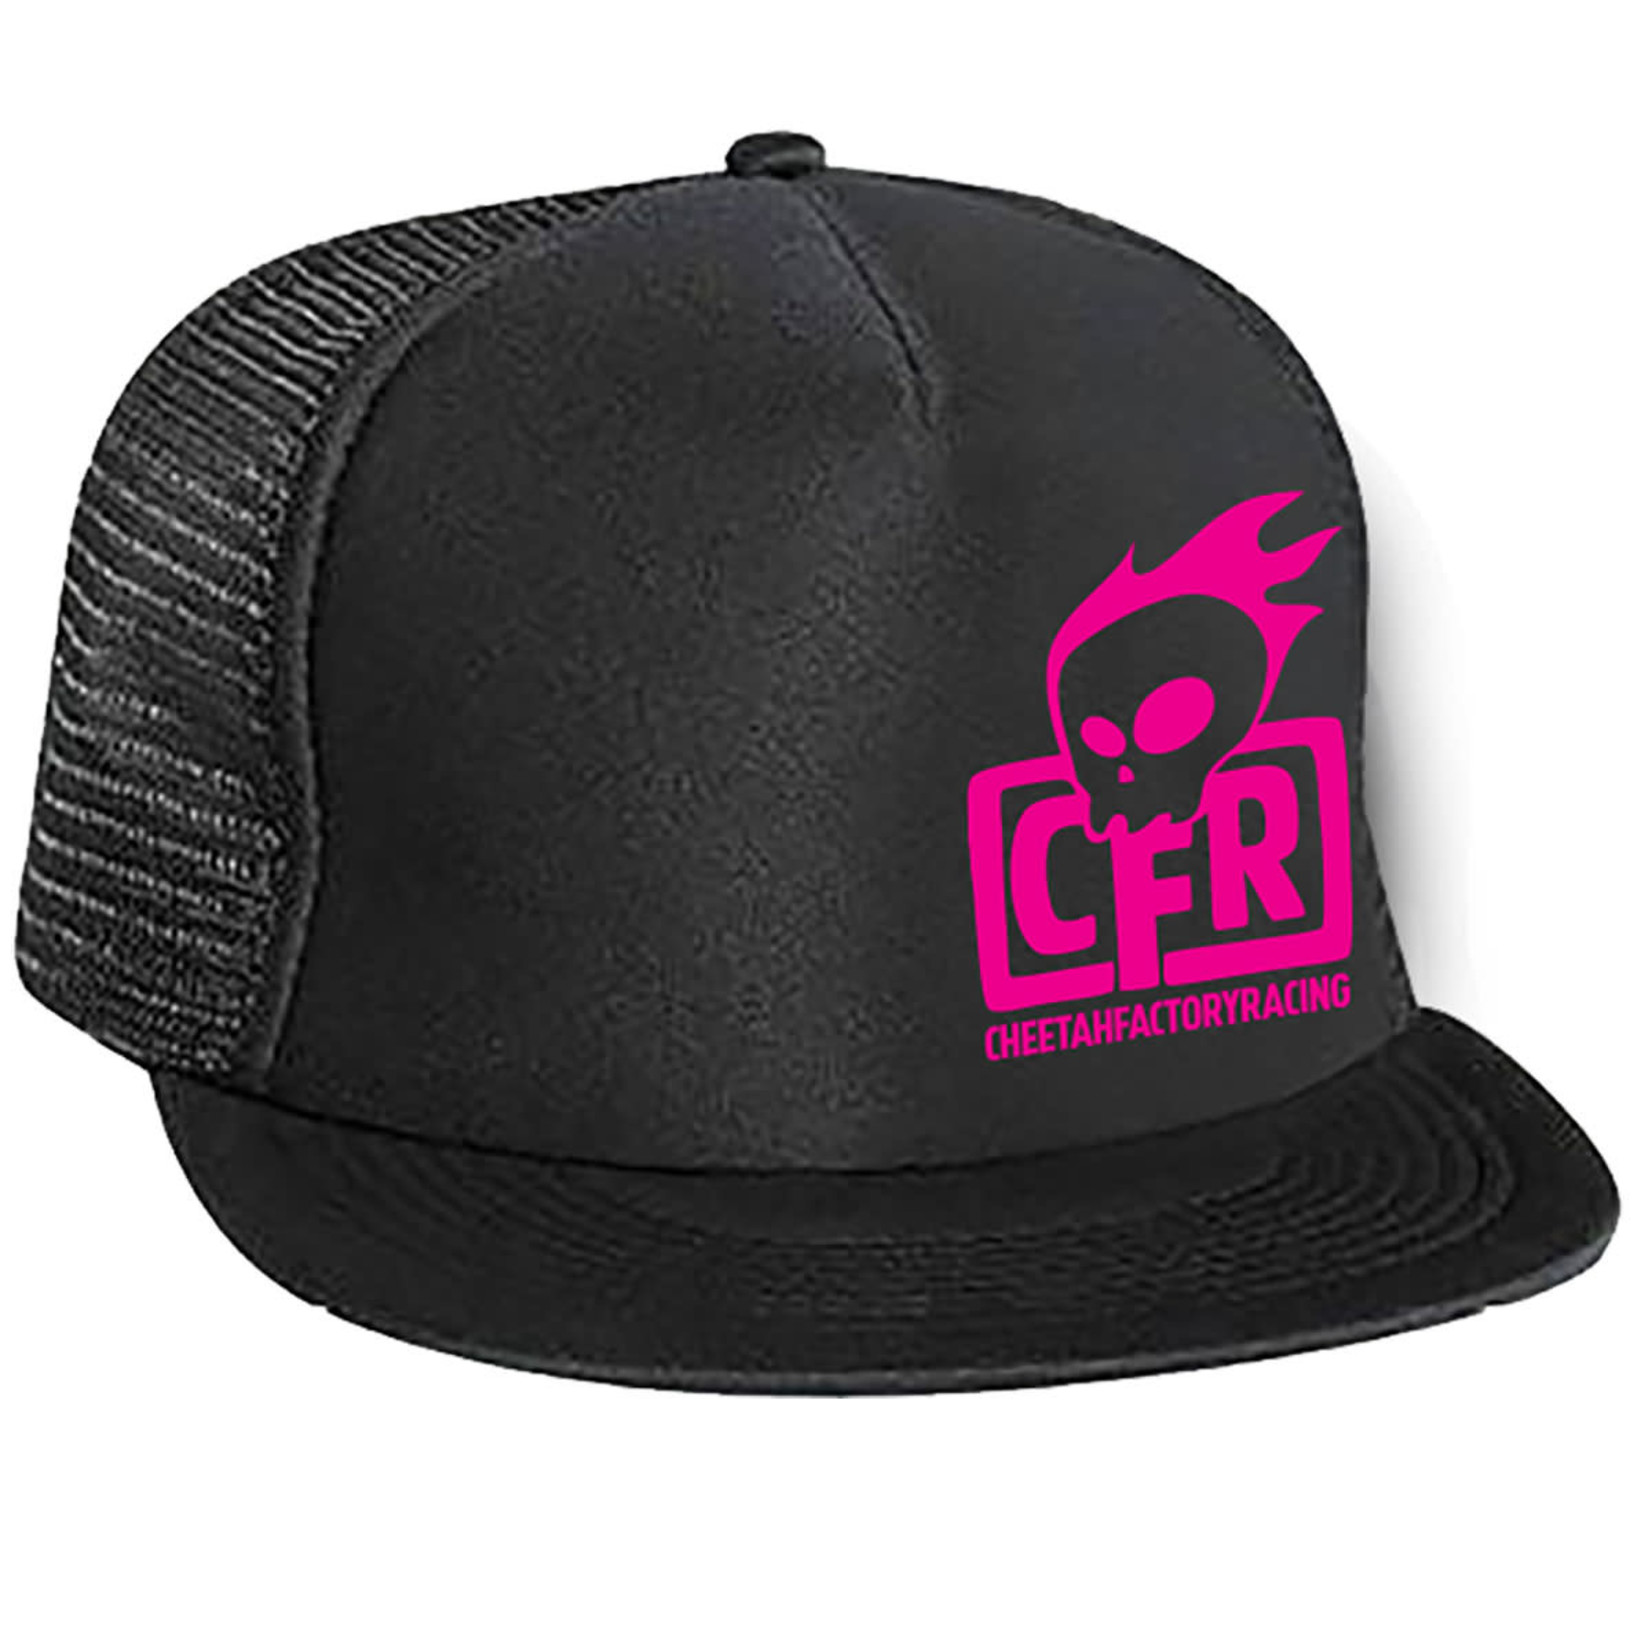 CFR CFR Flat Brim Baseball Hat